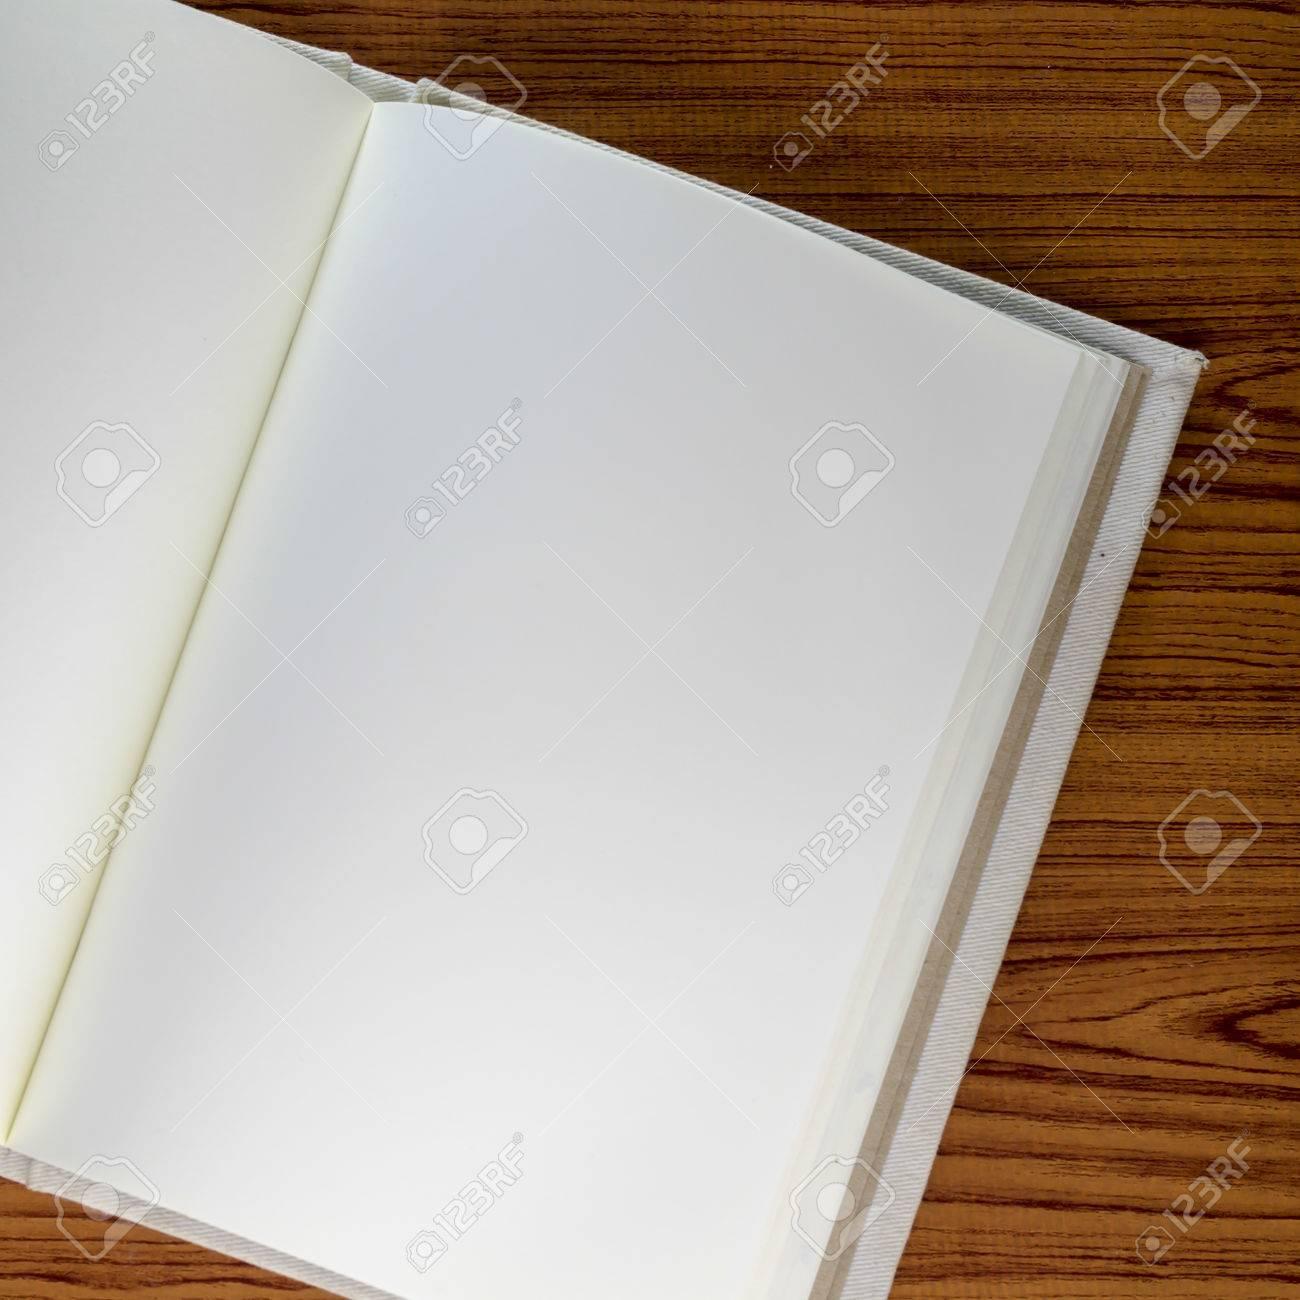 notebook on wood background Stock Photo - 26025356